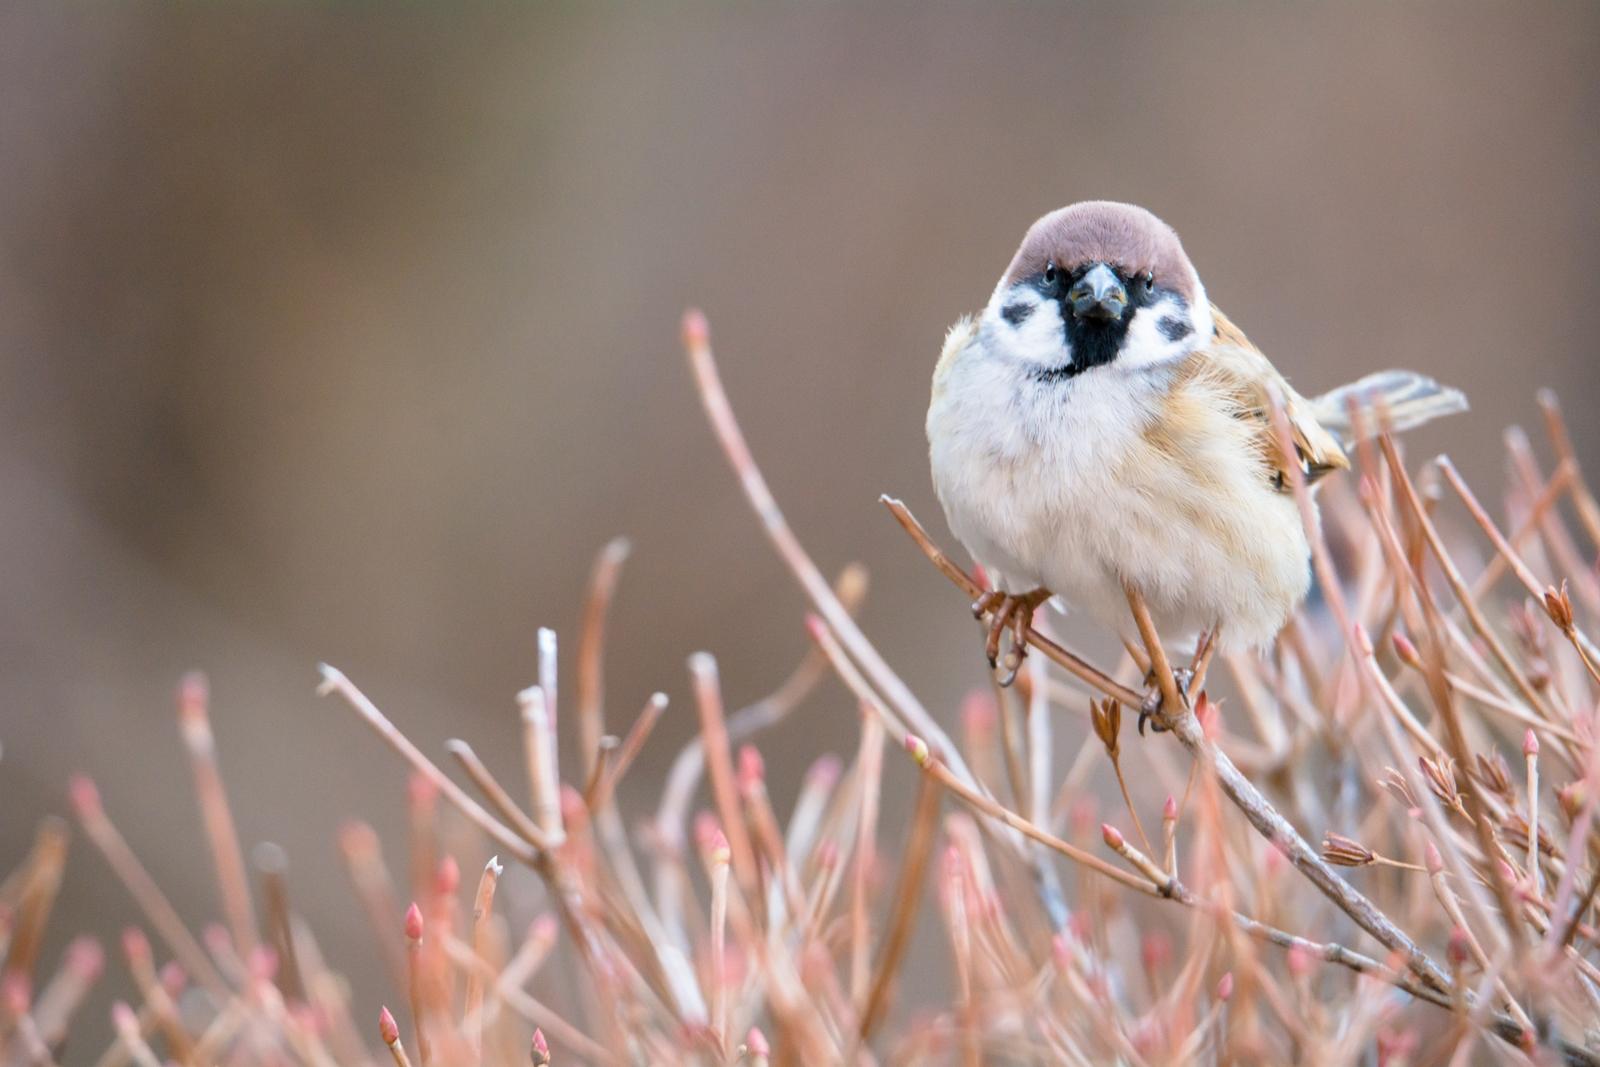 Photo: ぬくもりを待ちわびて Wait for warmth.  じっと待つ その時を待つ 膨らみ寒さに耐えながら 心癒すぬくもりを待つ  Sparrow. (スズメ) #cooljapan #365cooljapanmay  #birdphotography #birds #kawaii  #sigma  Nikon D7100 SIGMA 150-600mm F5-6.3 DG OS HSM Sports [ Day260, January 27th ] (3枚追加:Added 3 photo)  小鳥の詩朗読 http://youtu.be/BwE9LfjbMdc?list=PL2YtHGm0-R3qVsaqvQe9OYdJFCkI98wzF